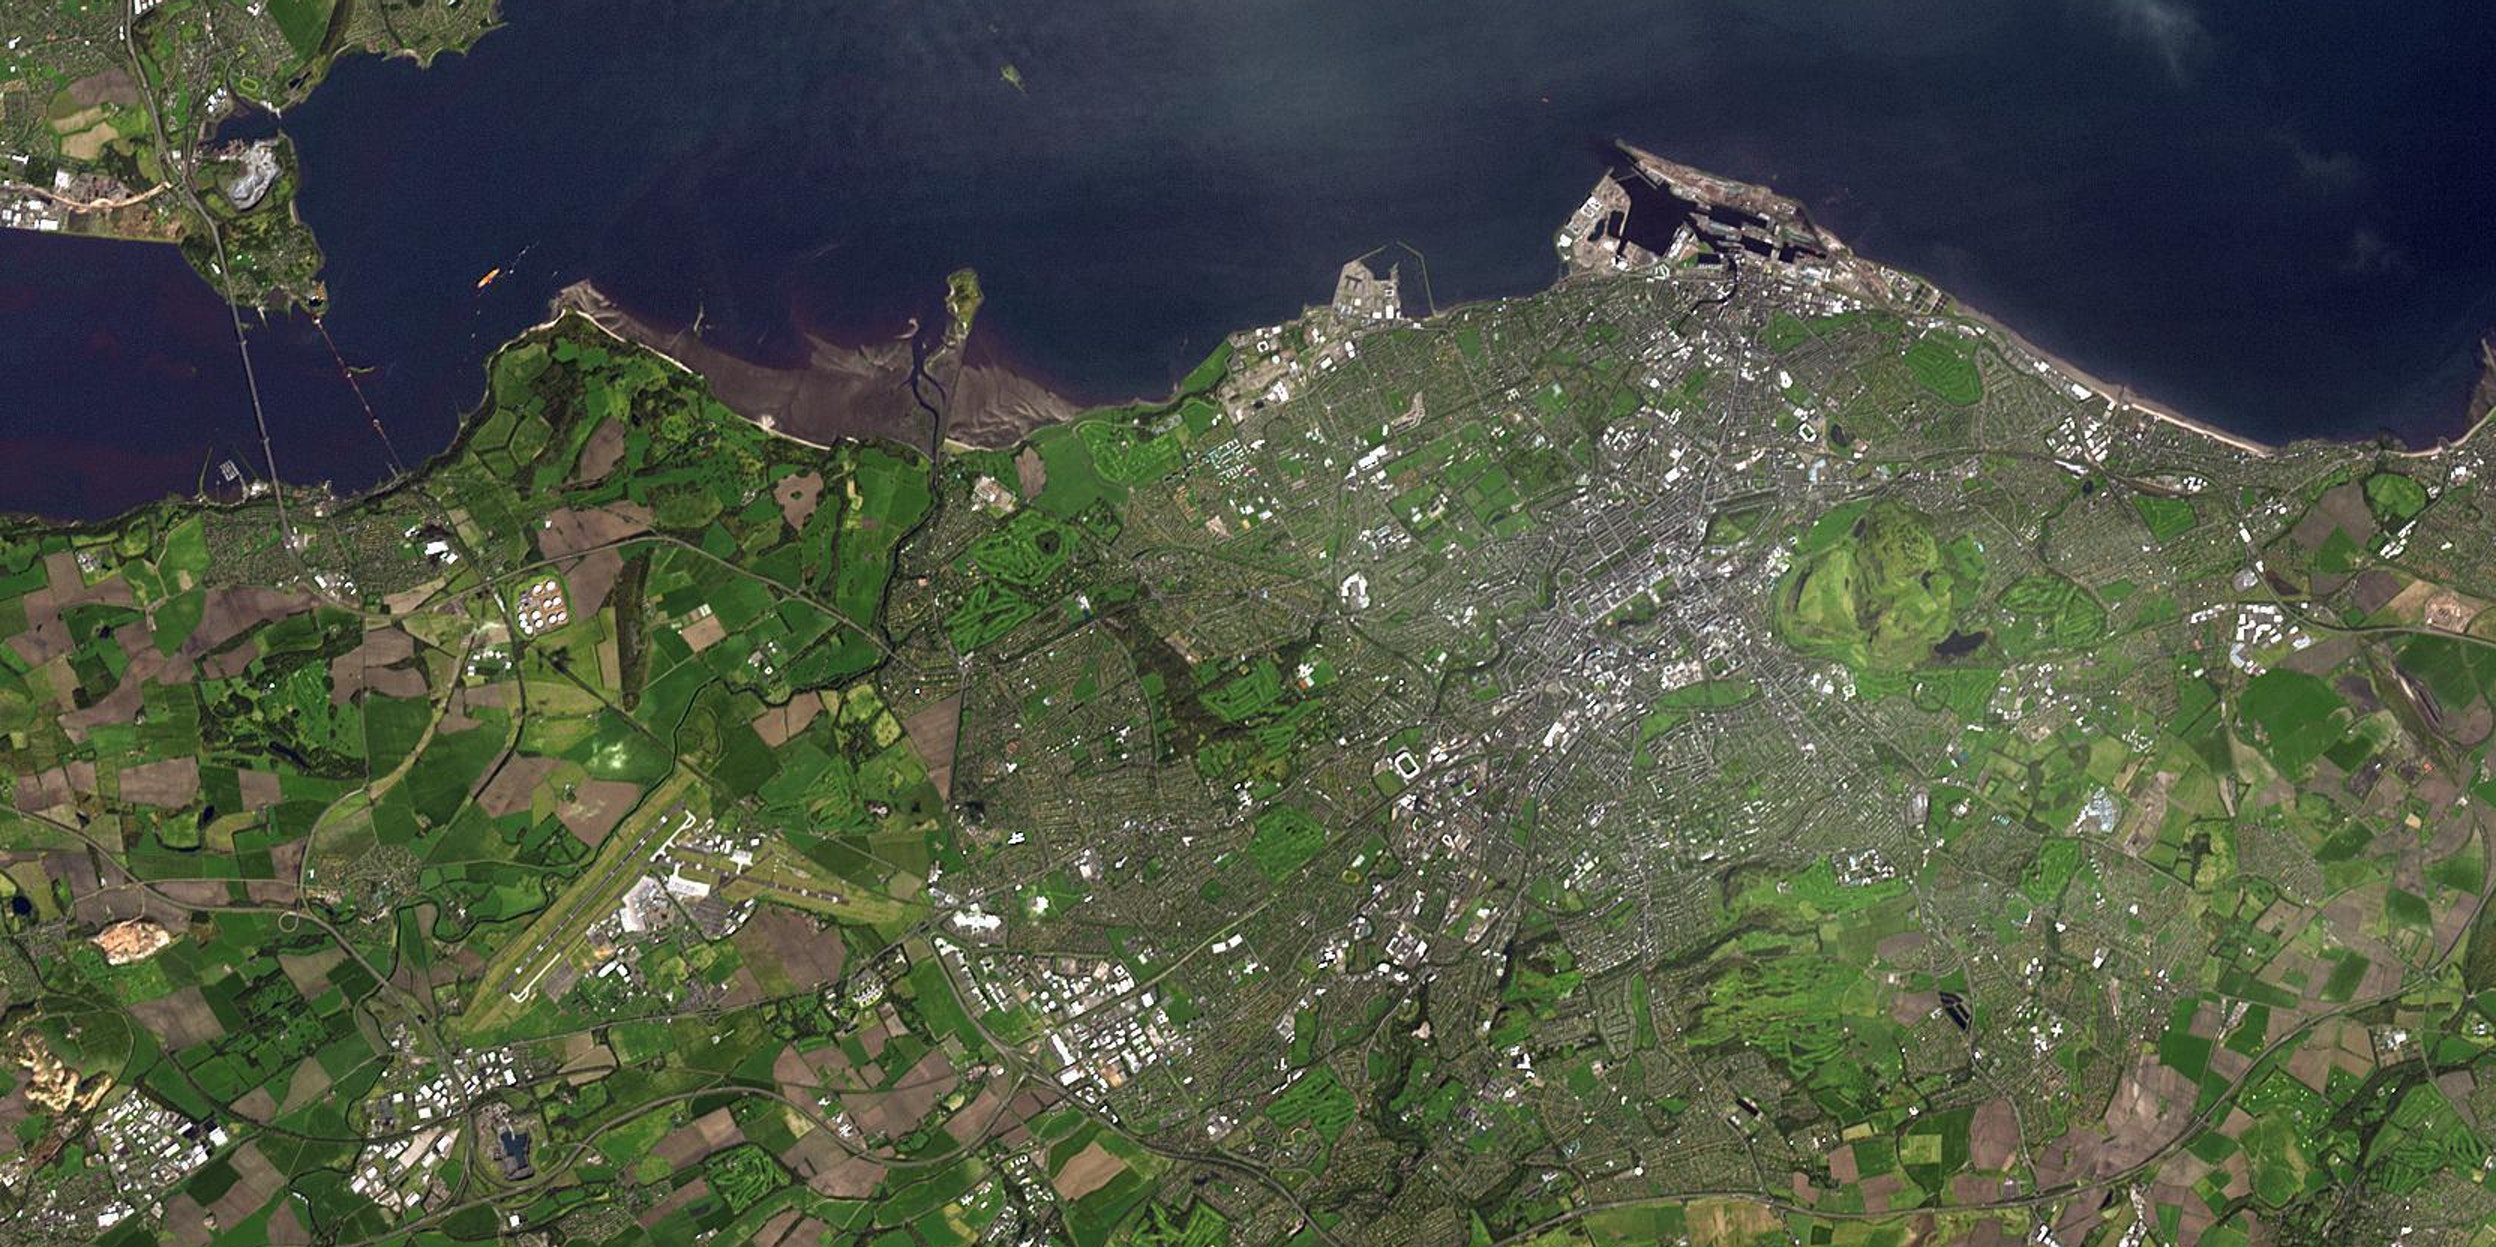 Edinburgh looks green from space.